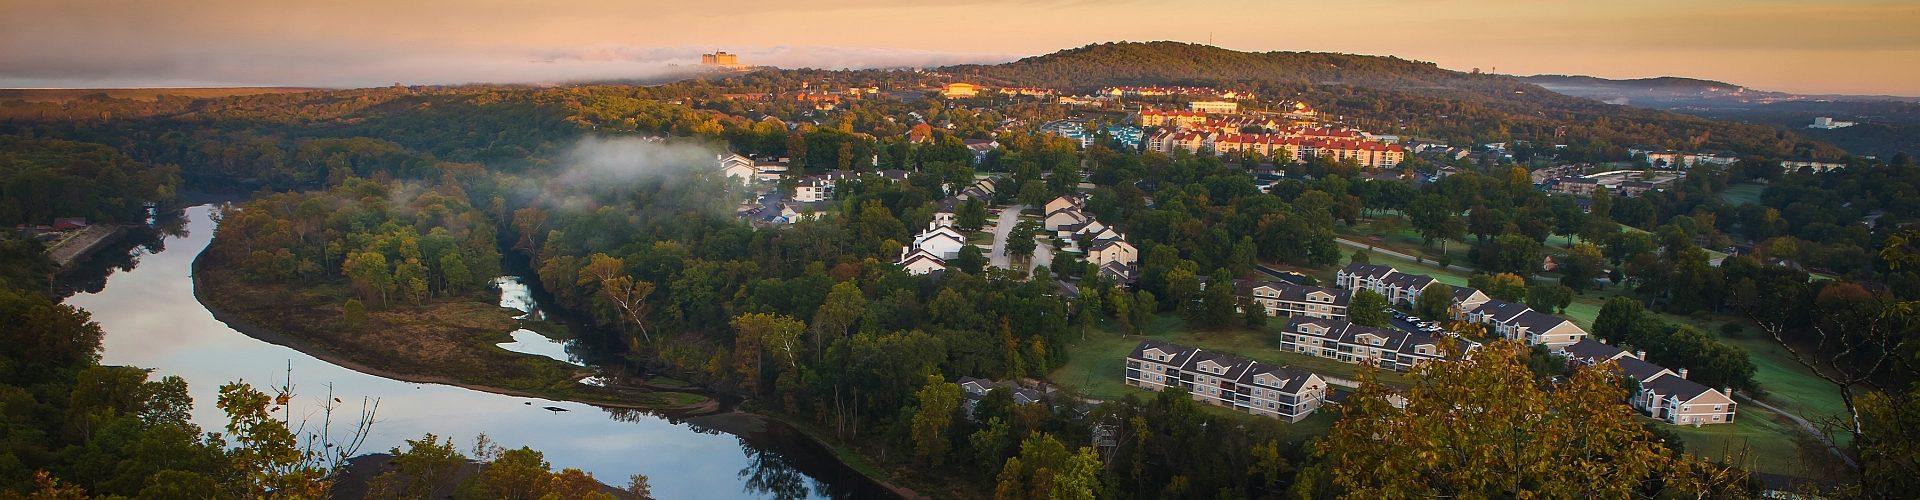 Condos & Condo Rentals in Branson, Missouri